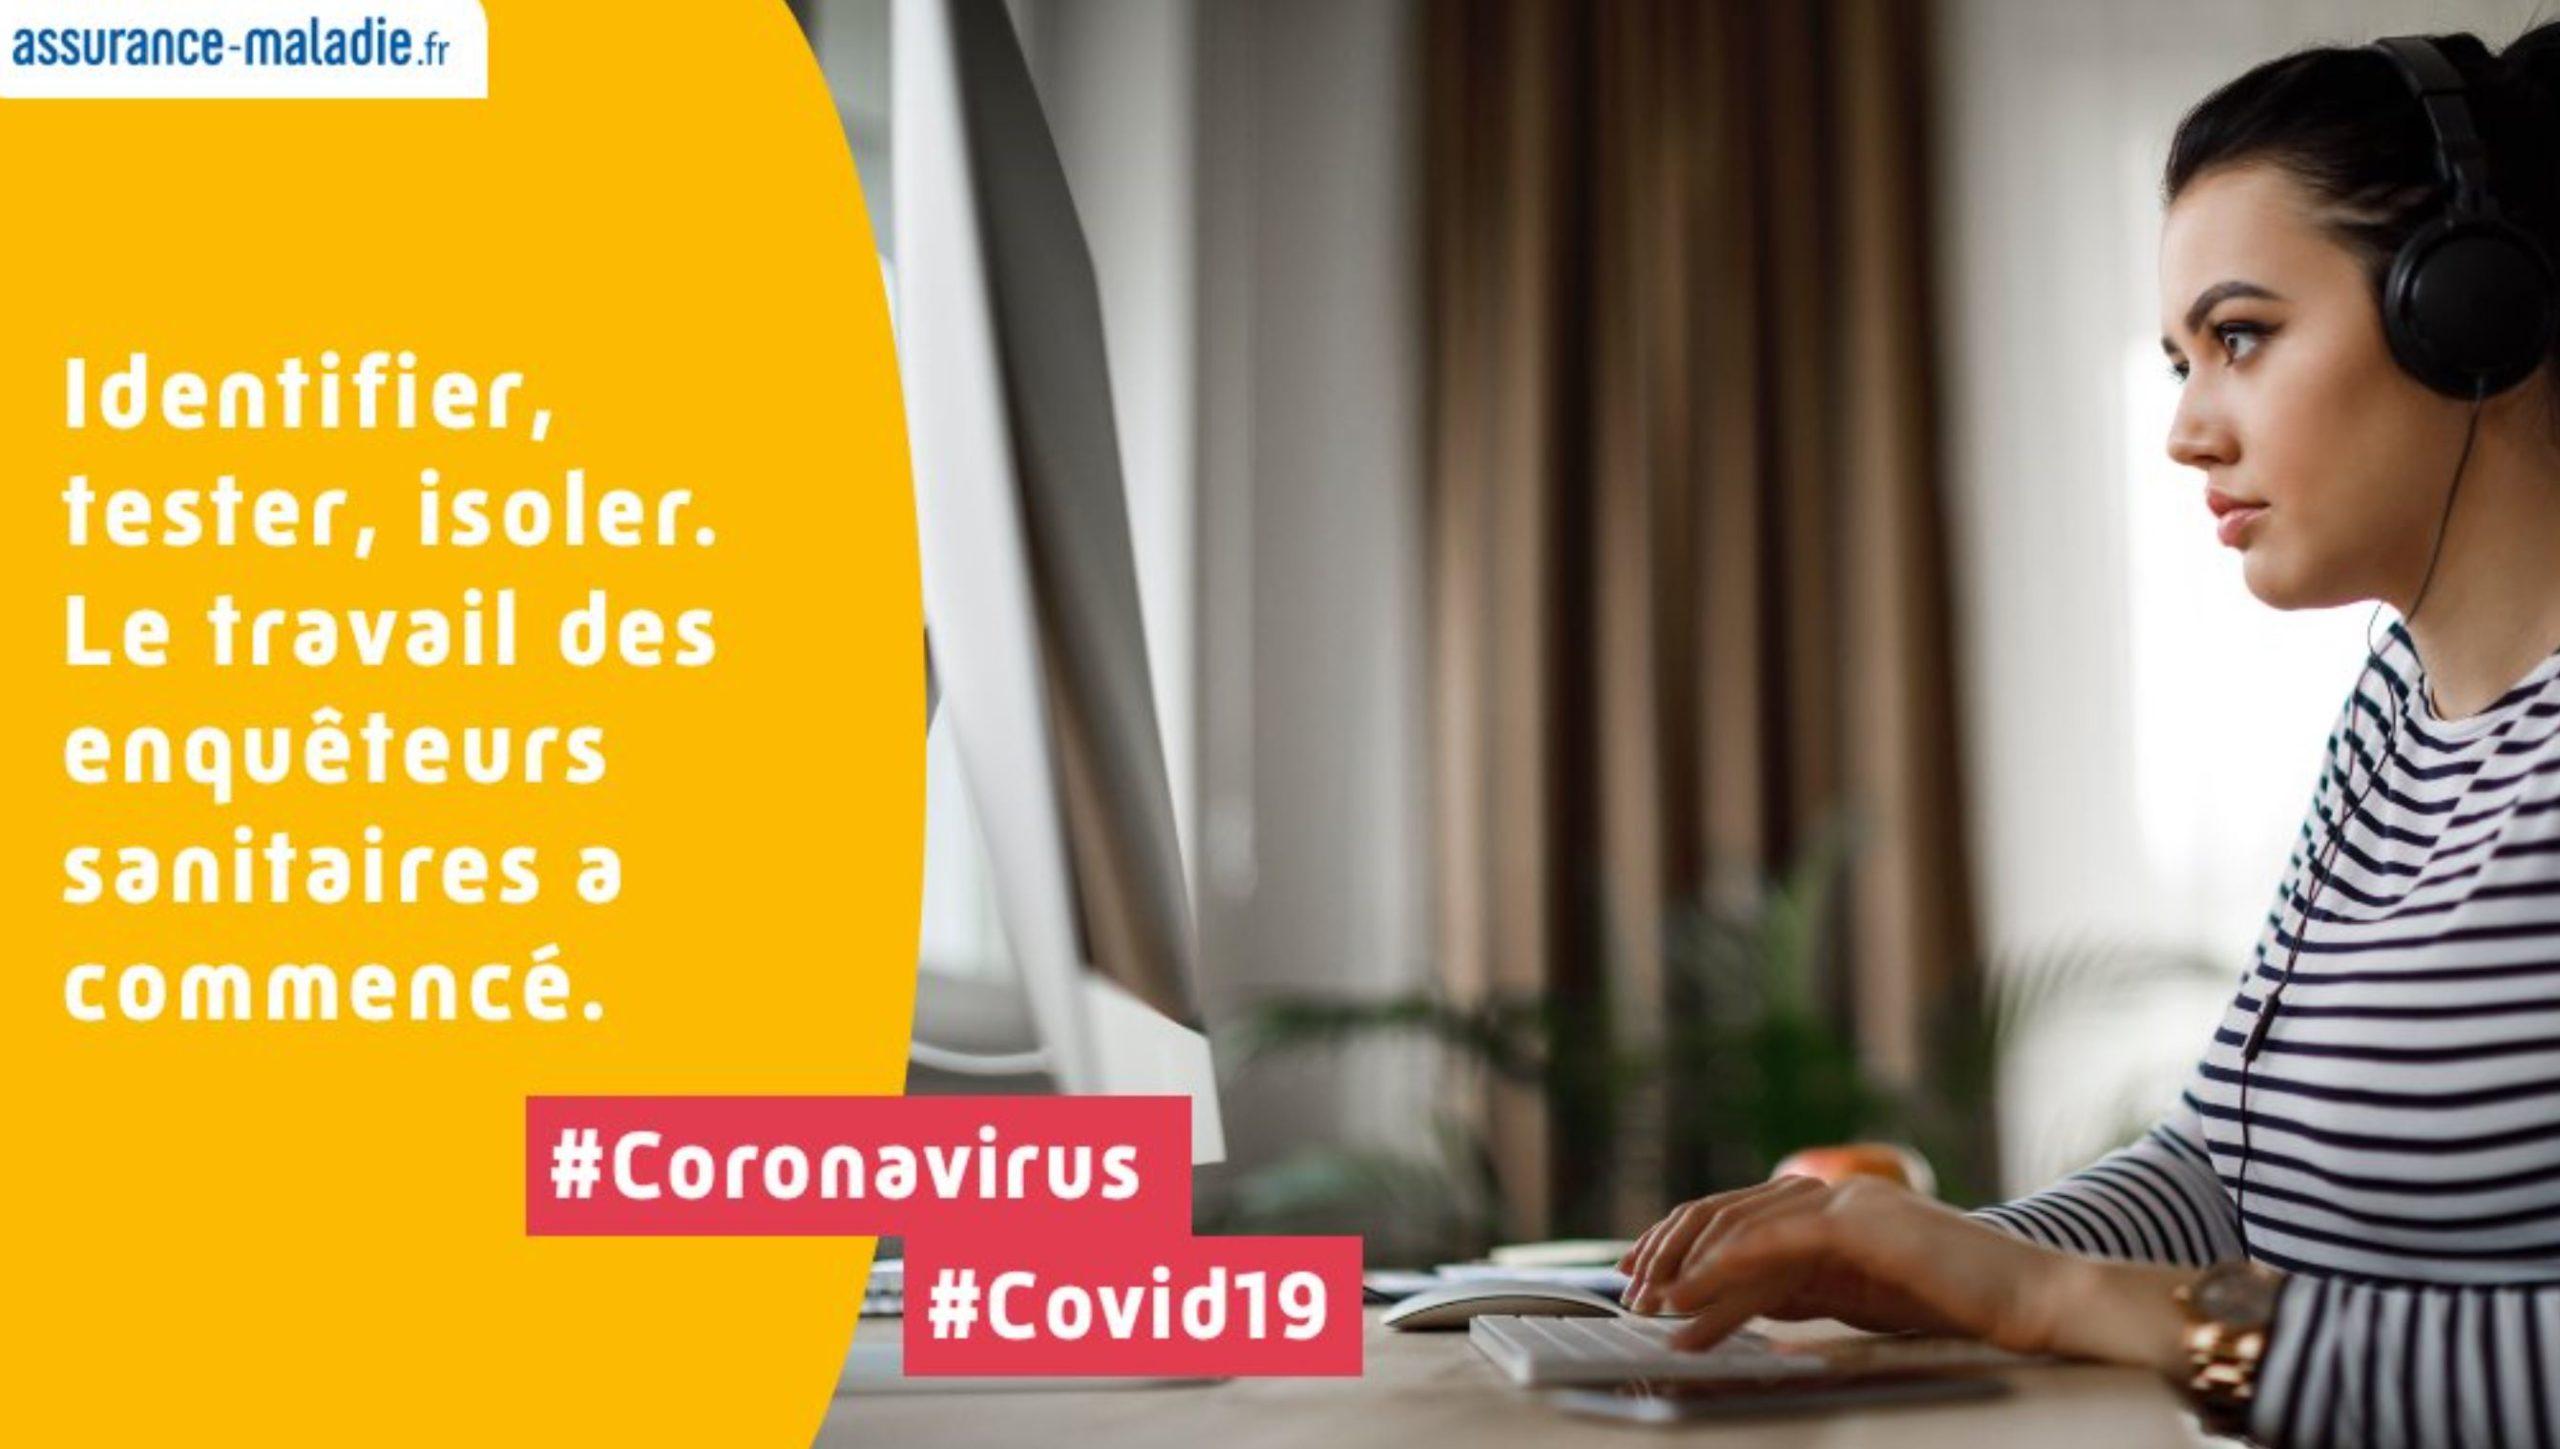 assurance maladie covid-19